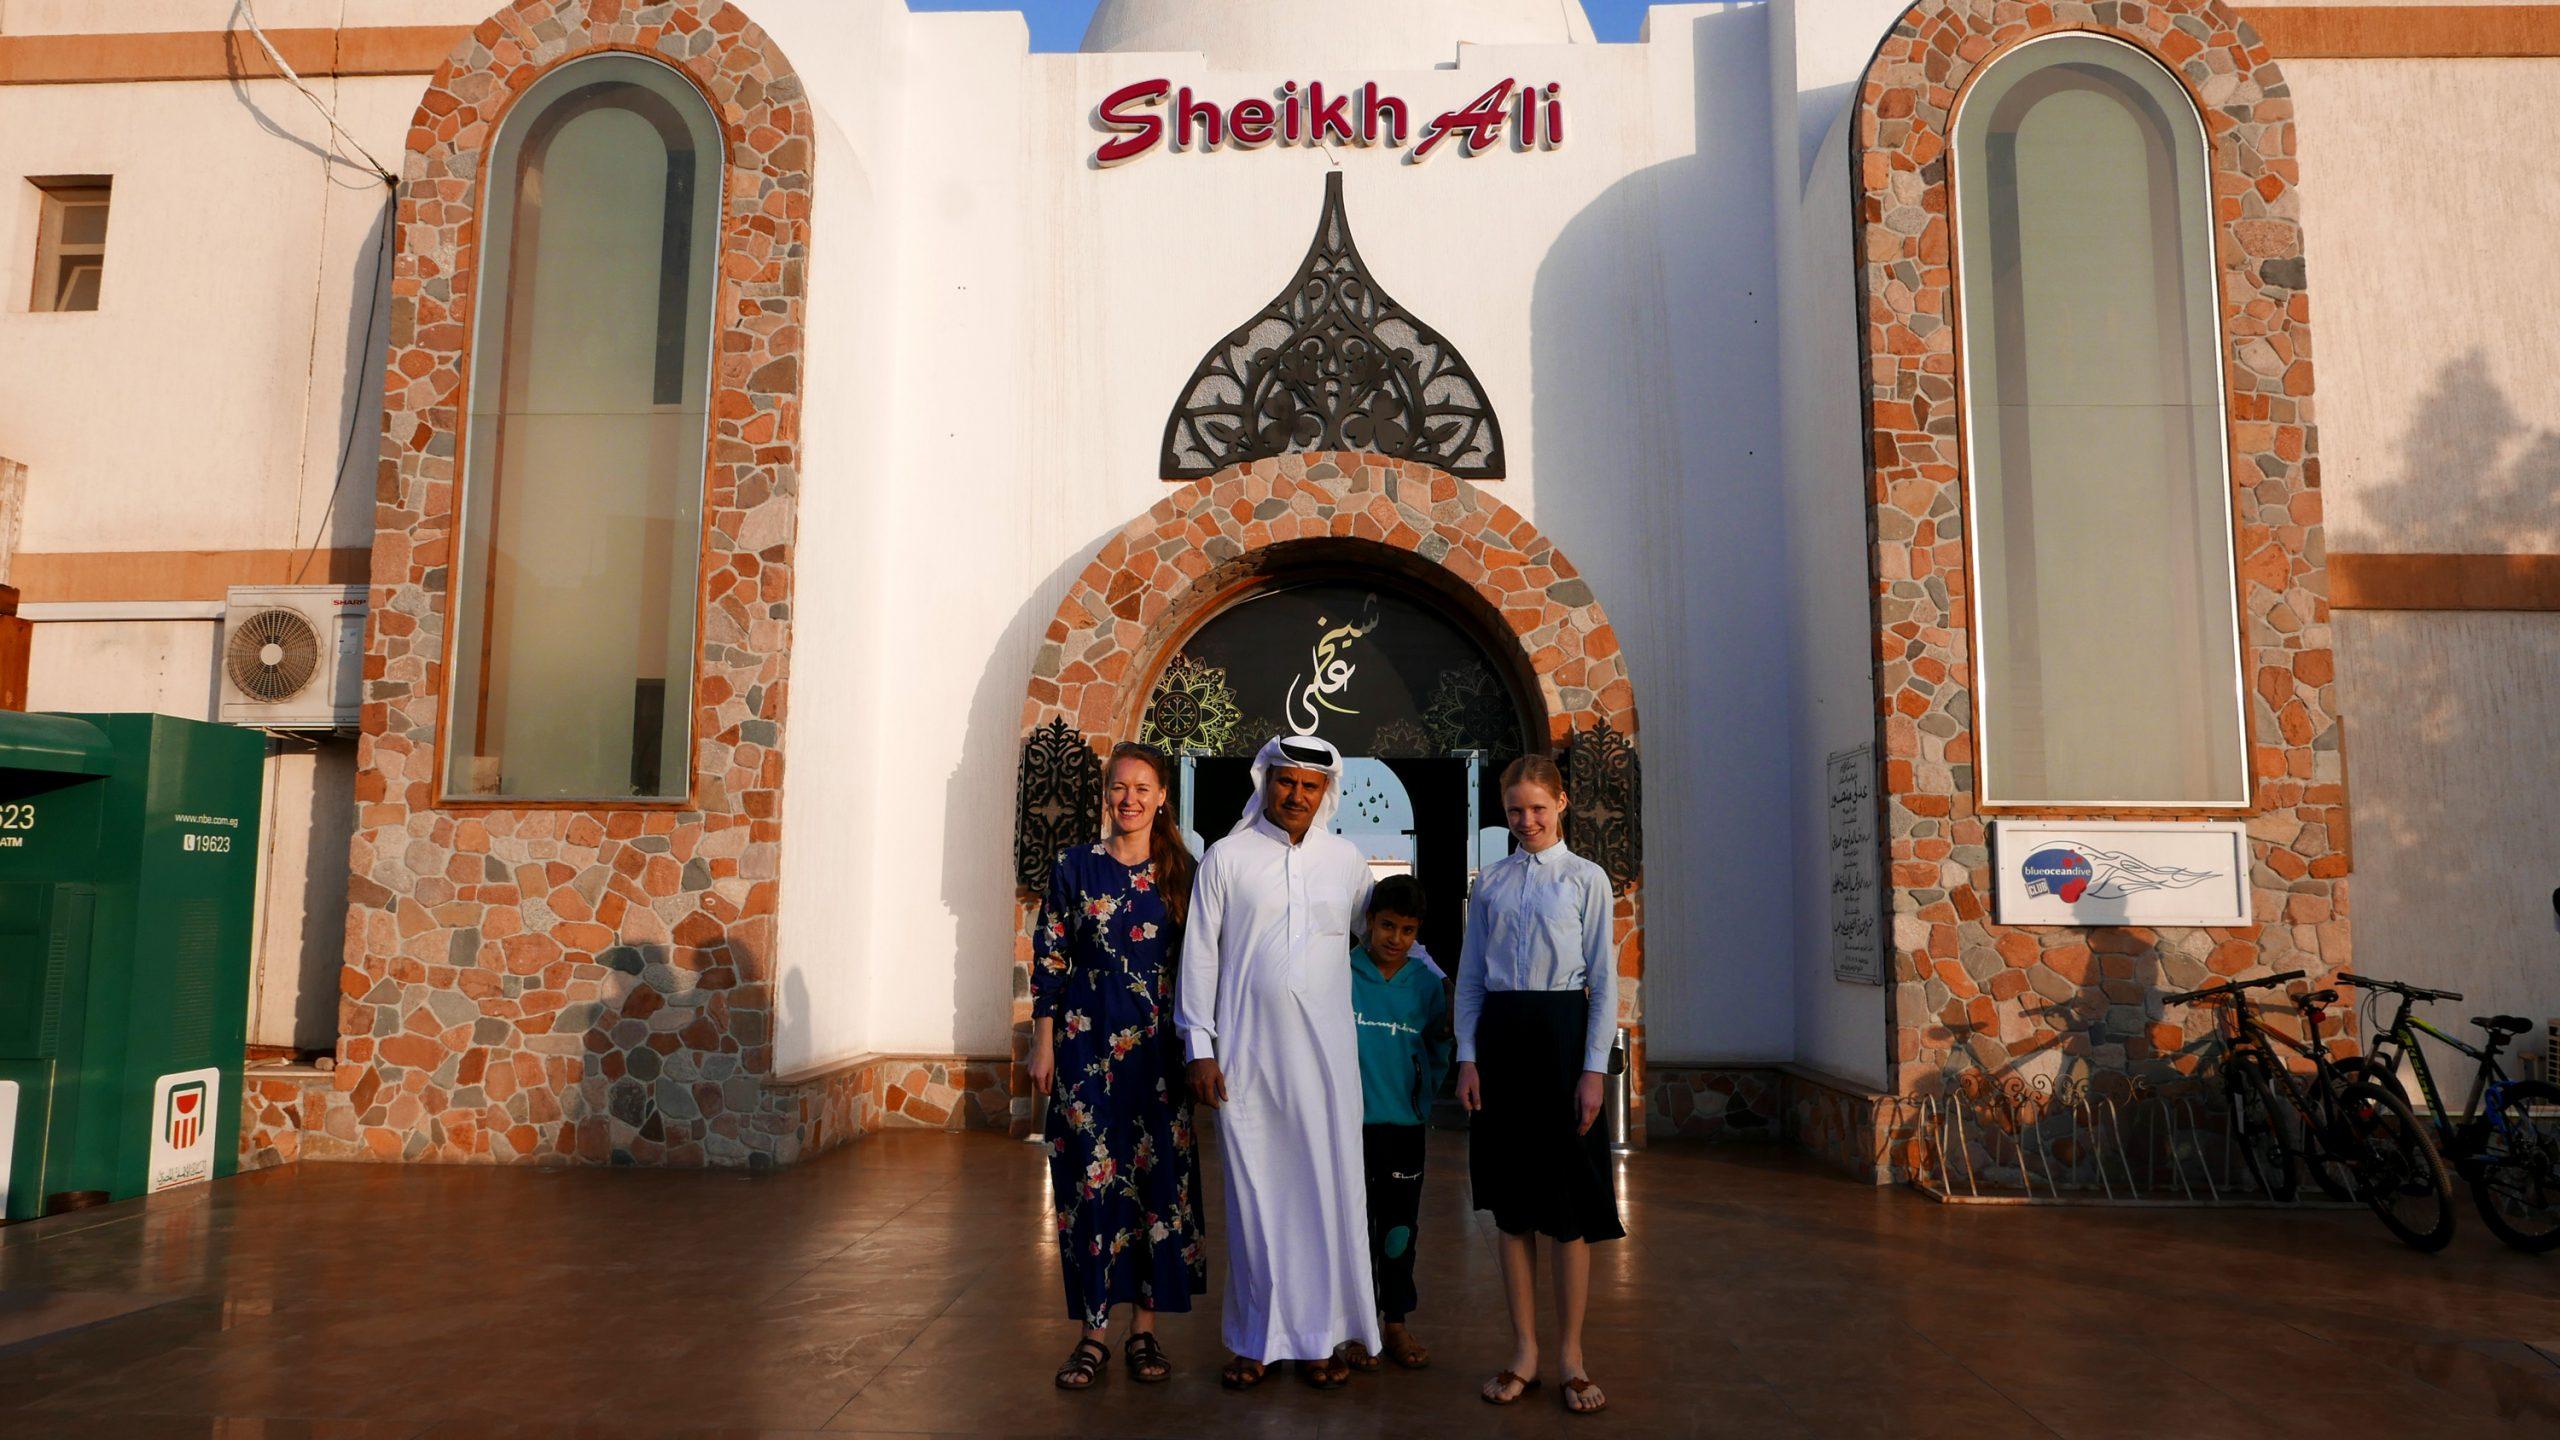 sheikh ali hotel dahab egypt